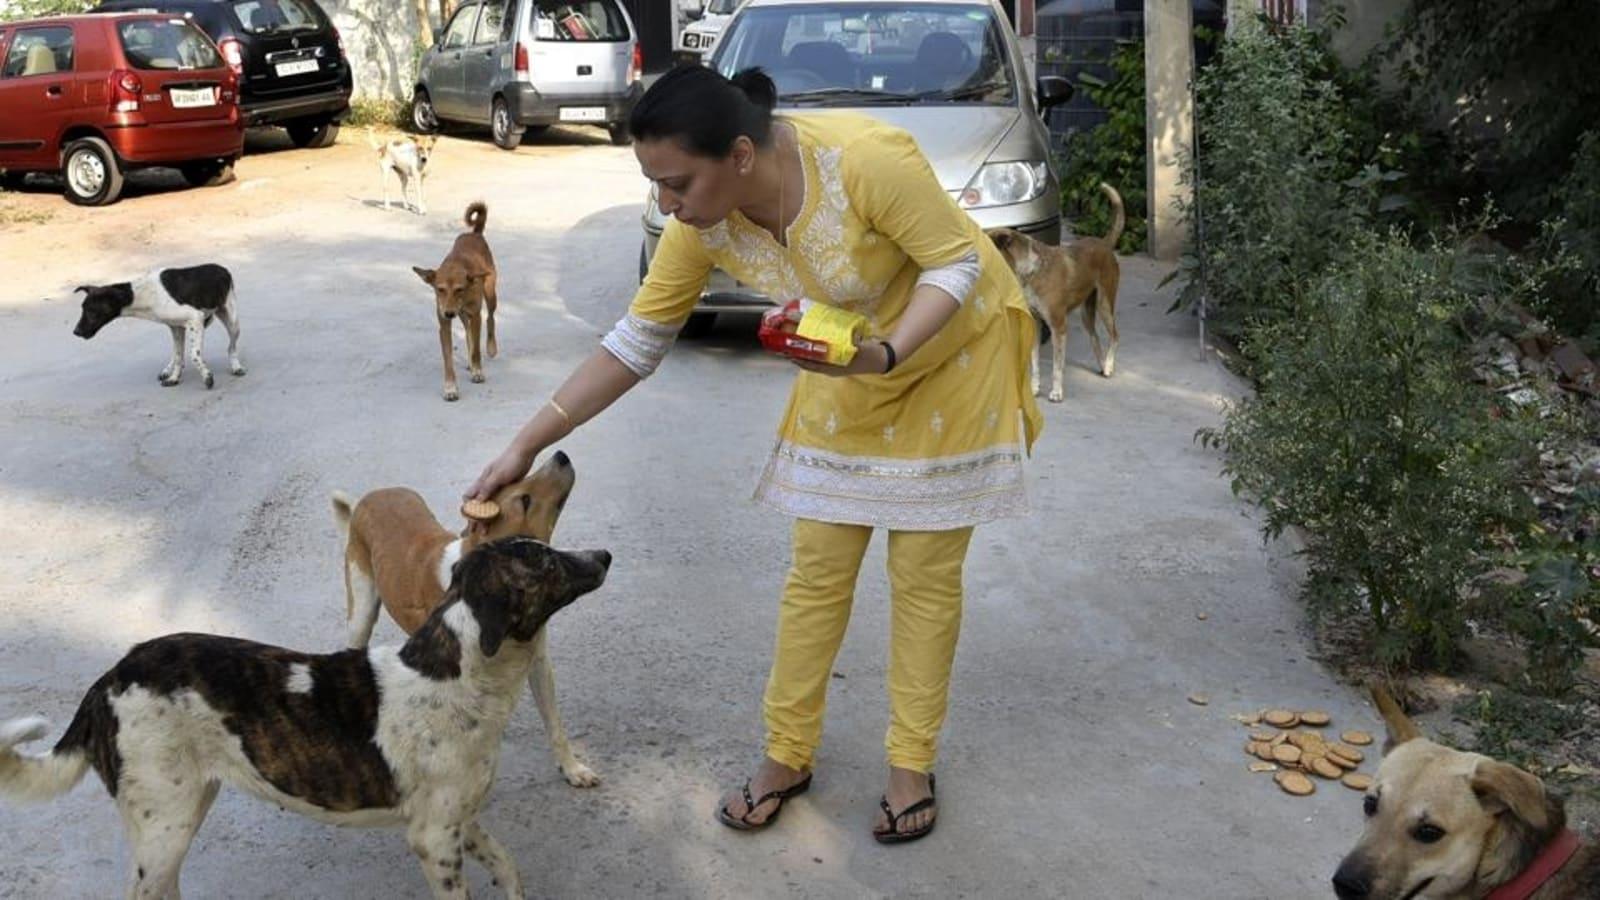 https://images.hindustantimes.com/img/2021/10/04/1600x900/14b7e116-03dc-11ec-9348-047e6c6570e7_1629700702246_1633311424594.jpg